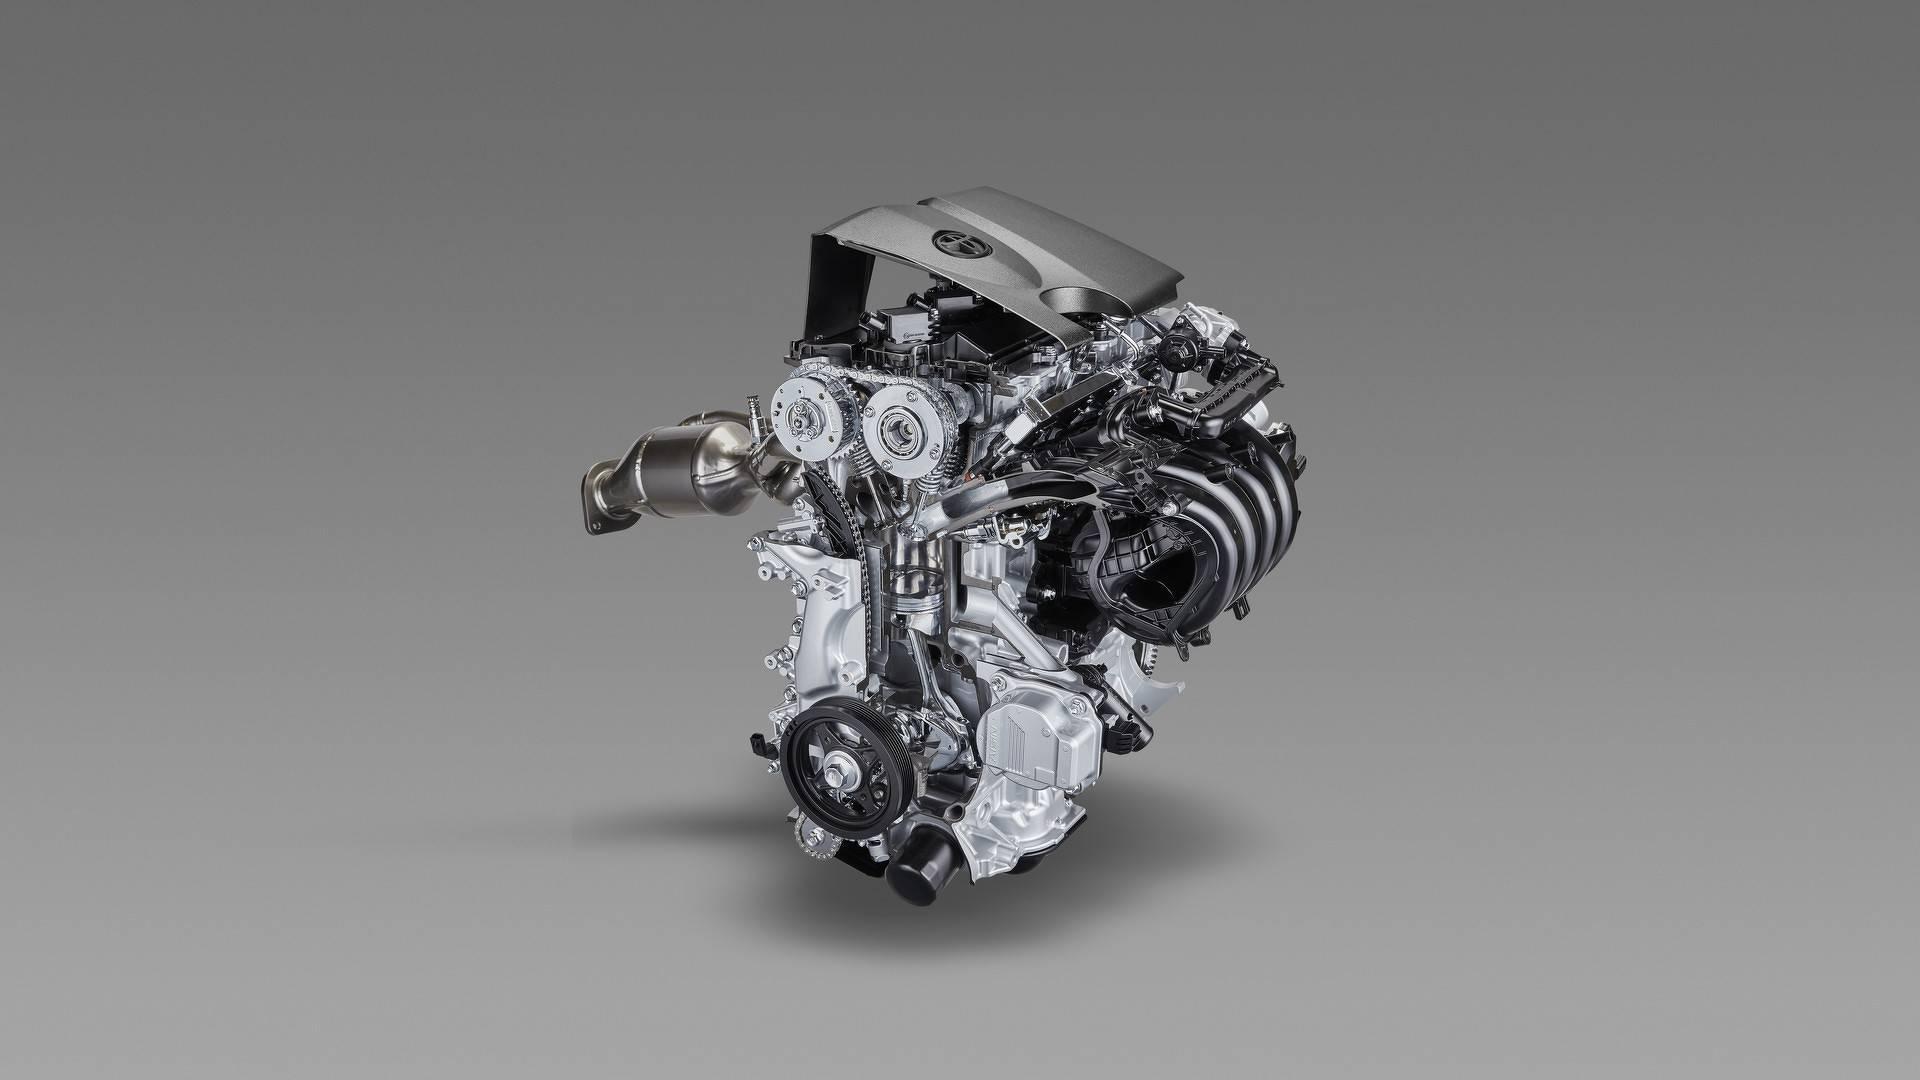 toyota-dynamic-force-20-liter-gasoline-engine